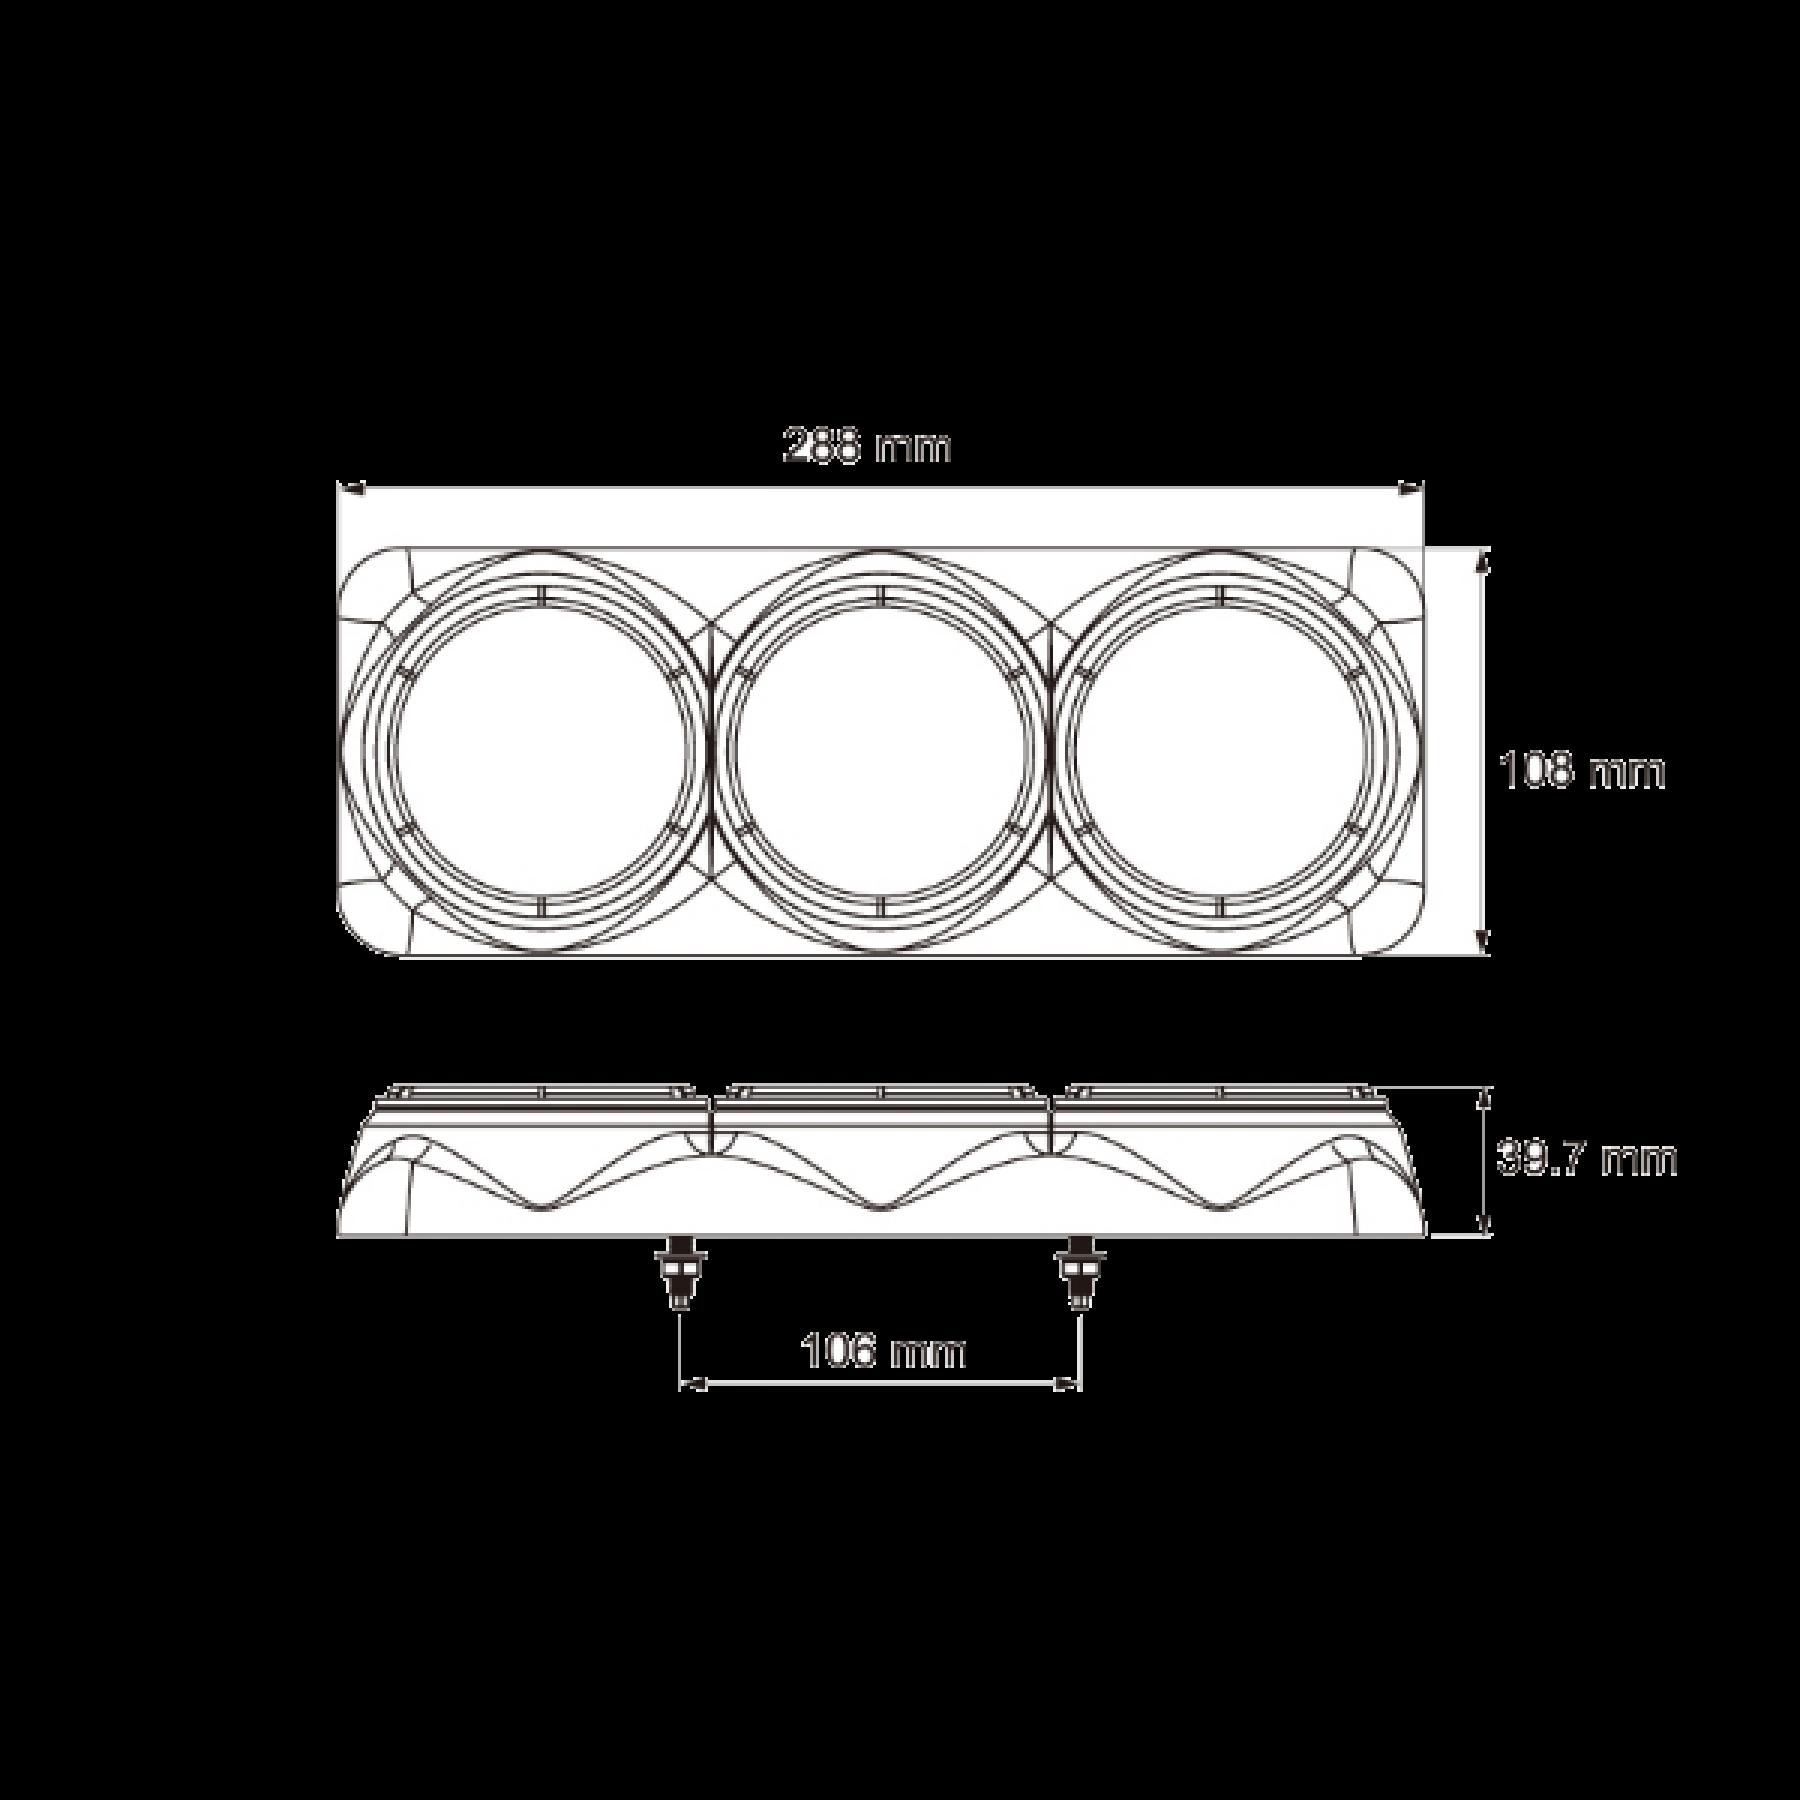 Achterlicht LED 4-functies 12/24v